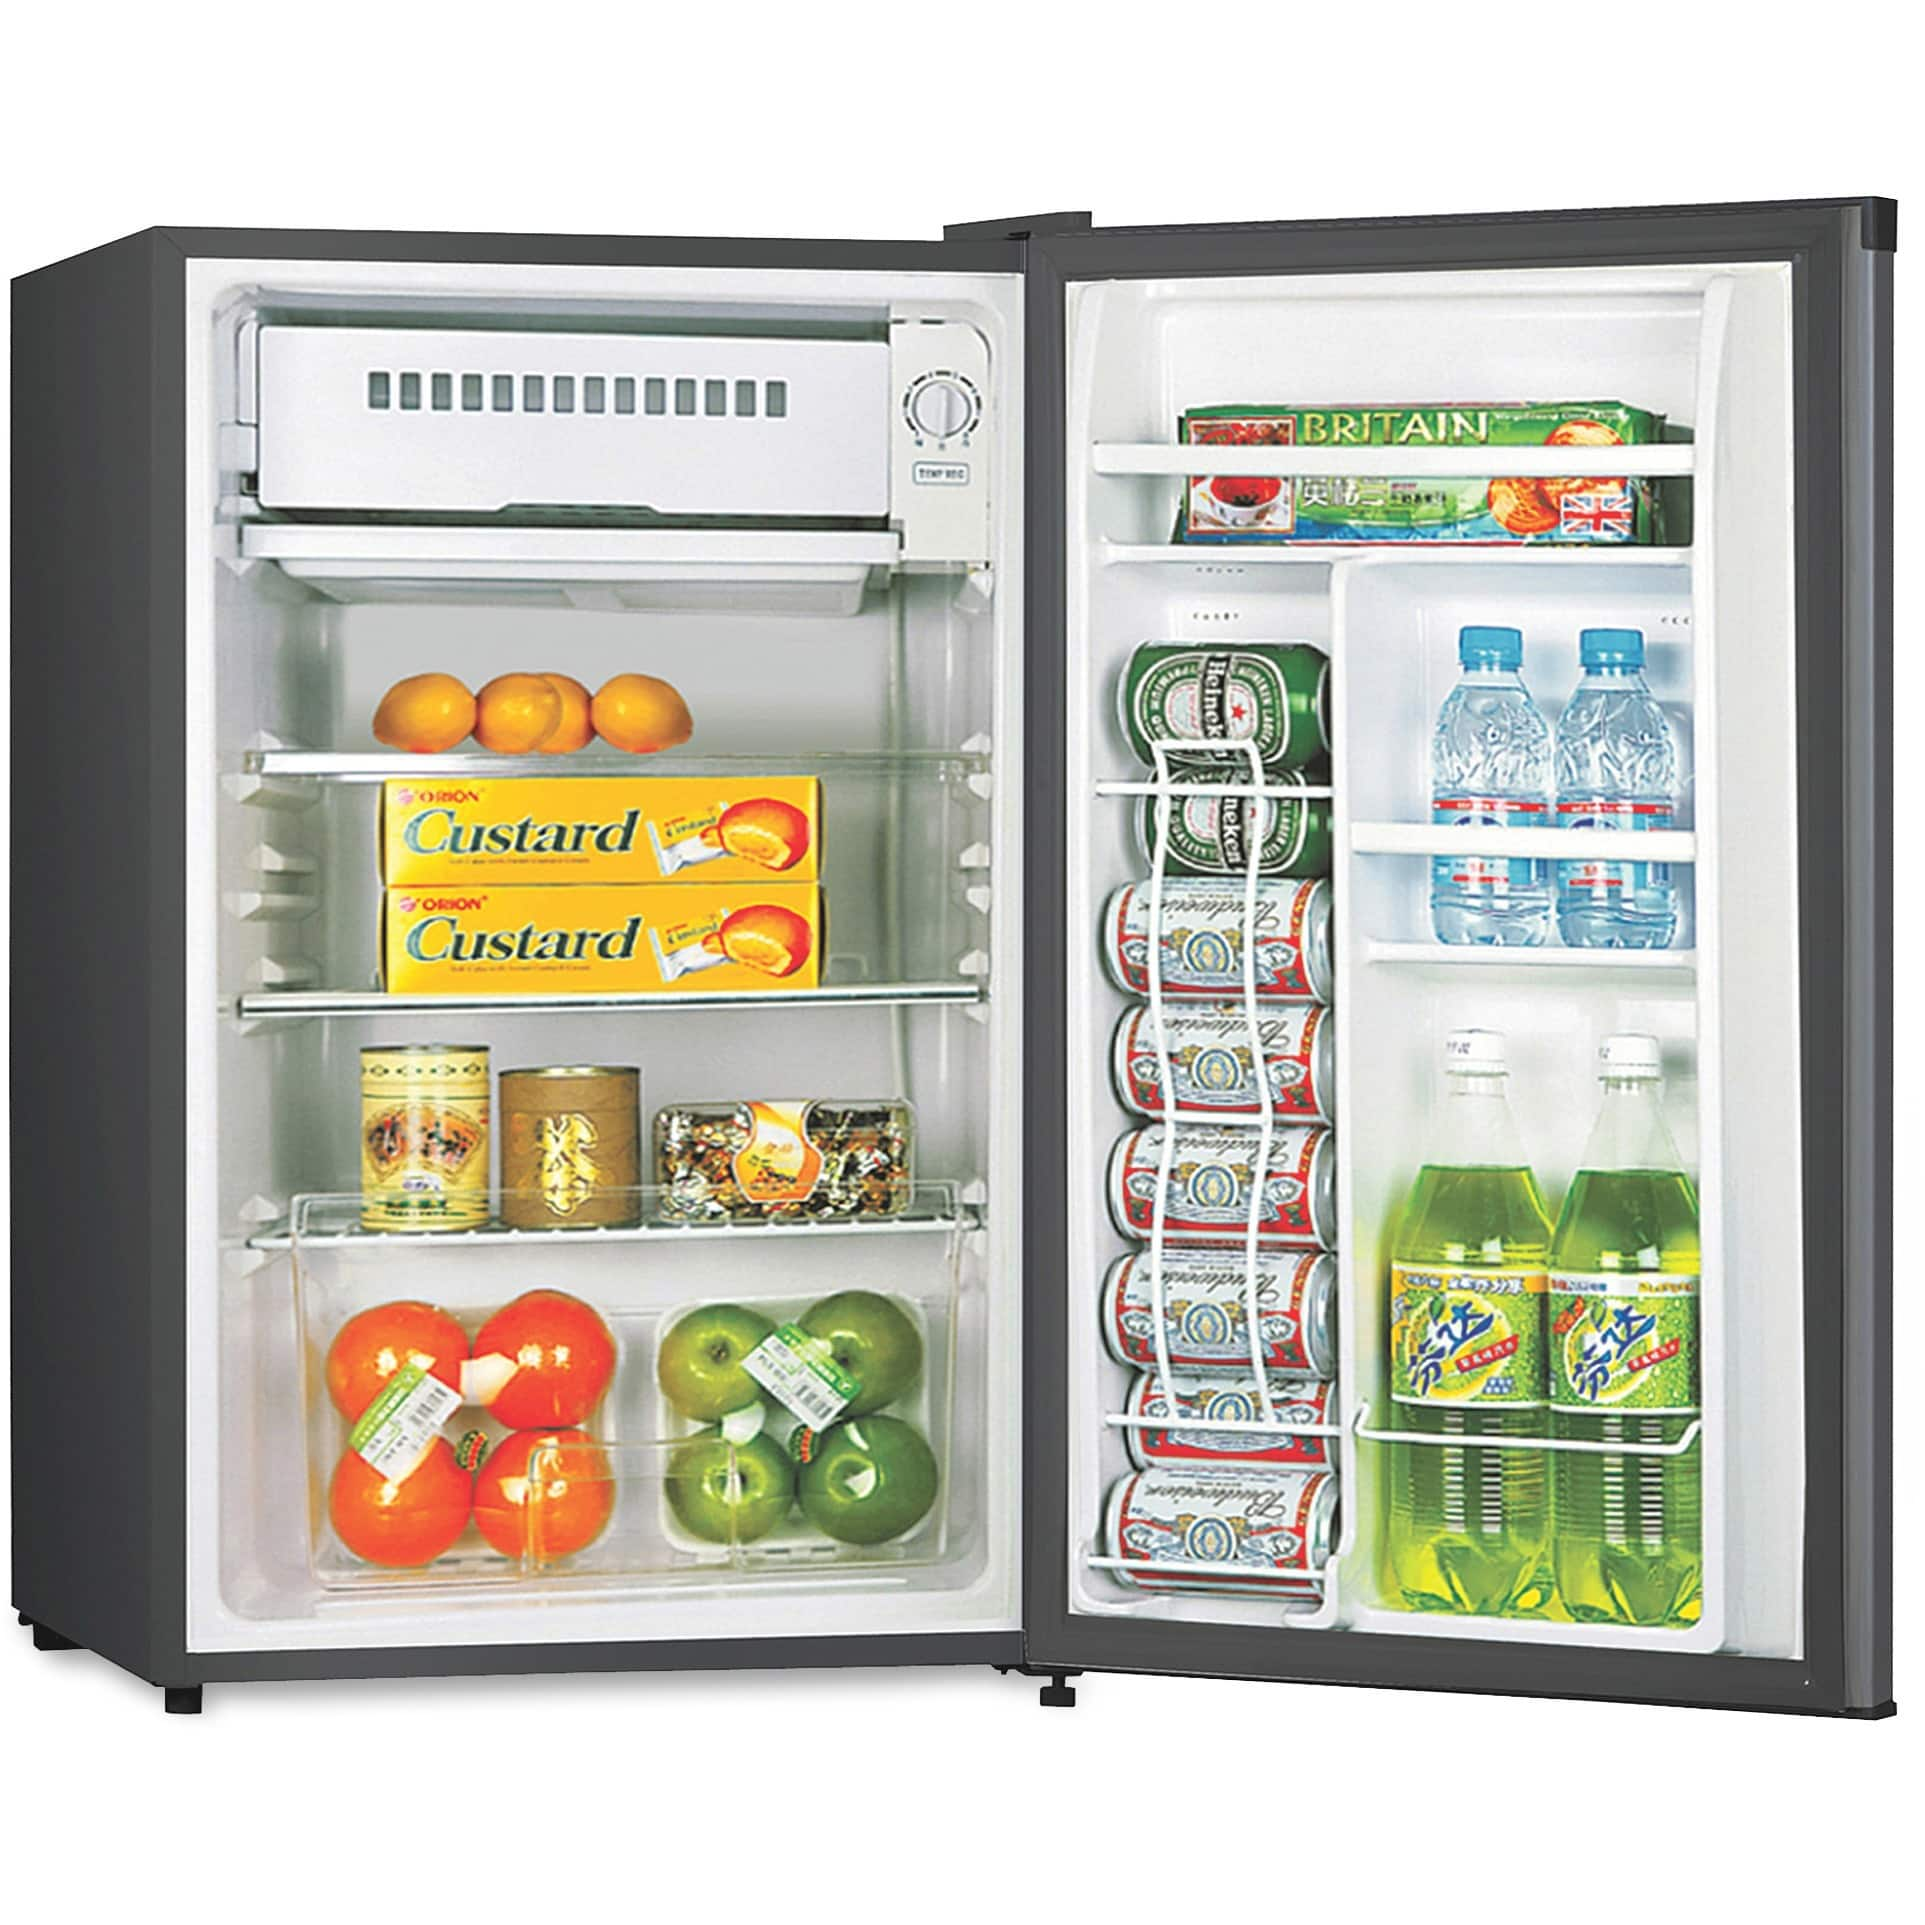 "Lorell Compact Refrigerator, 3.3L, 20-1/2"" x 18-3/10"" x 34-3/10', BK (LLR72313) $120"